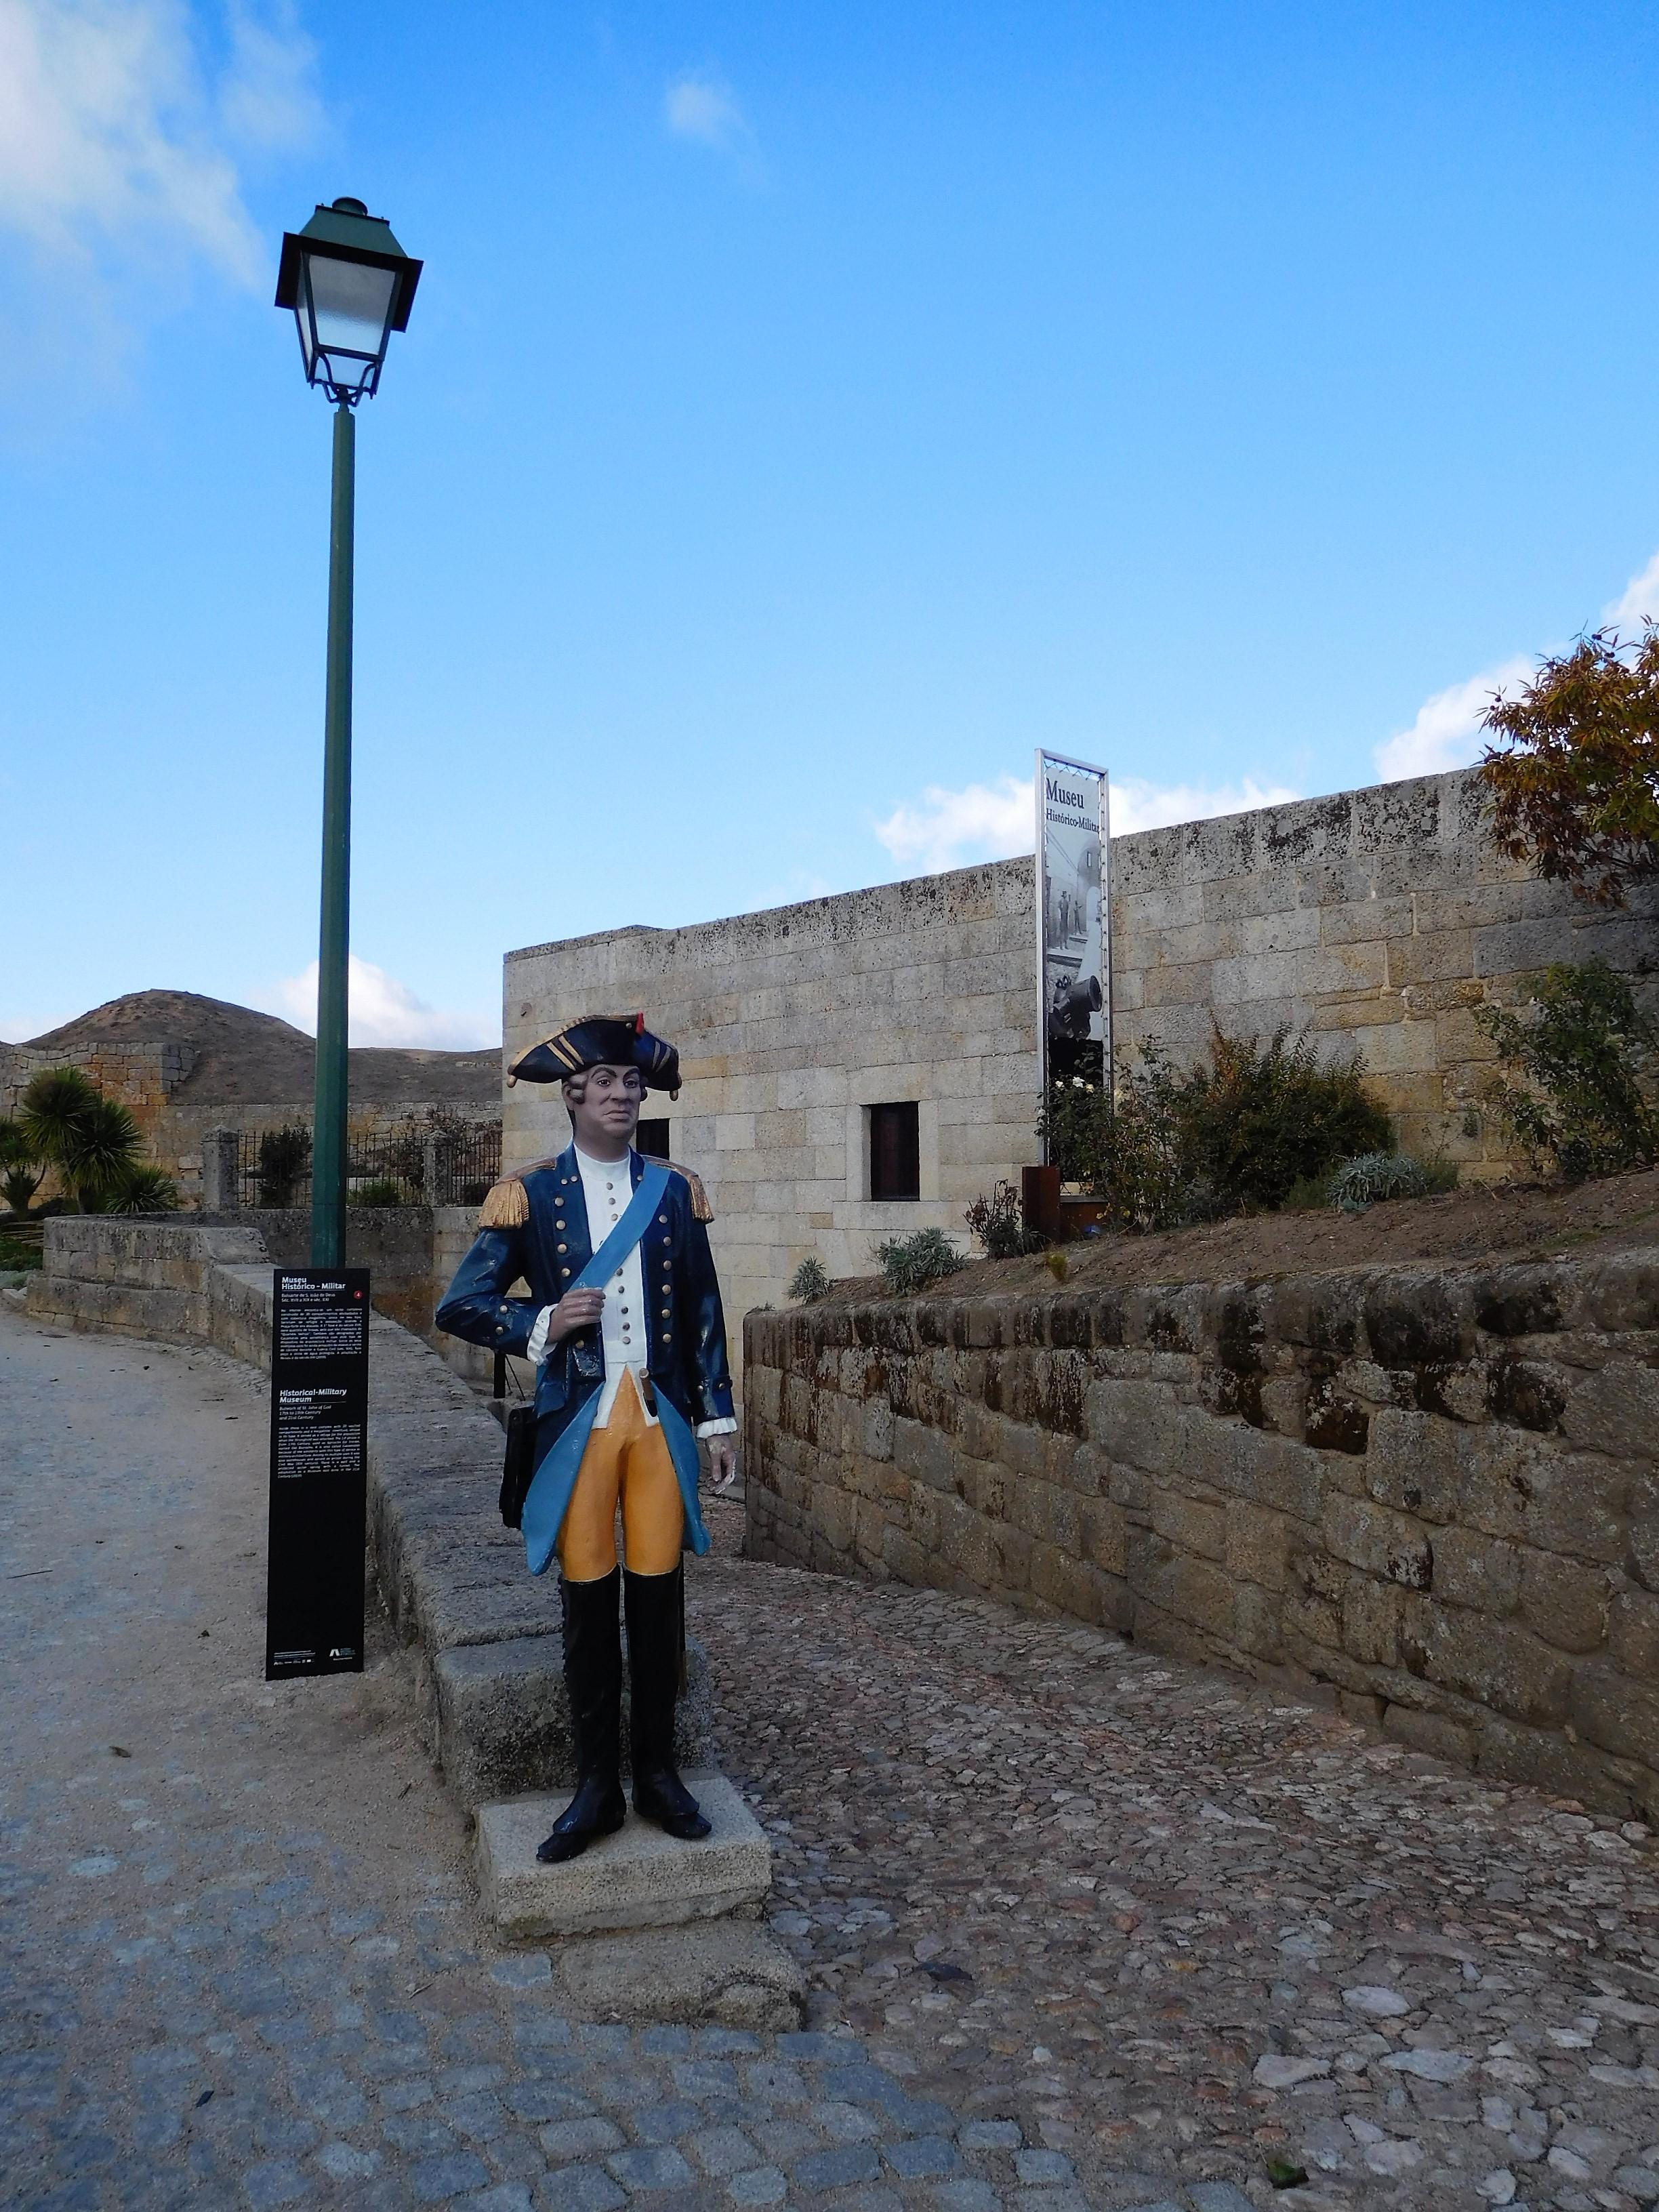 Almeida, Portugal – Historical-Military Museum